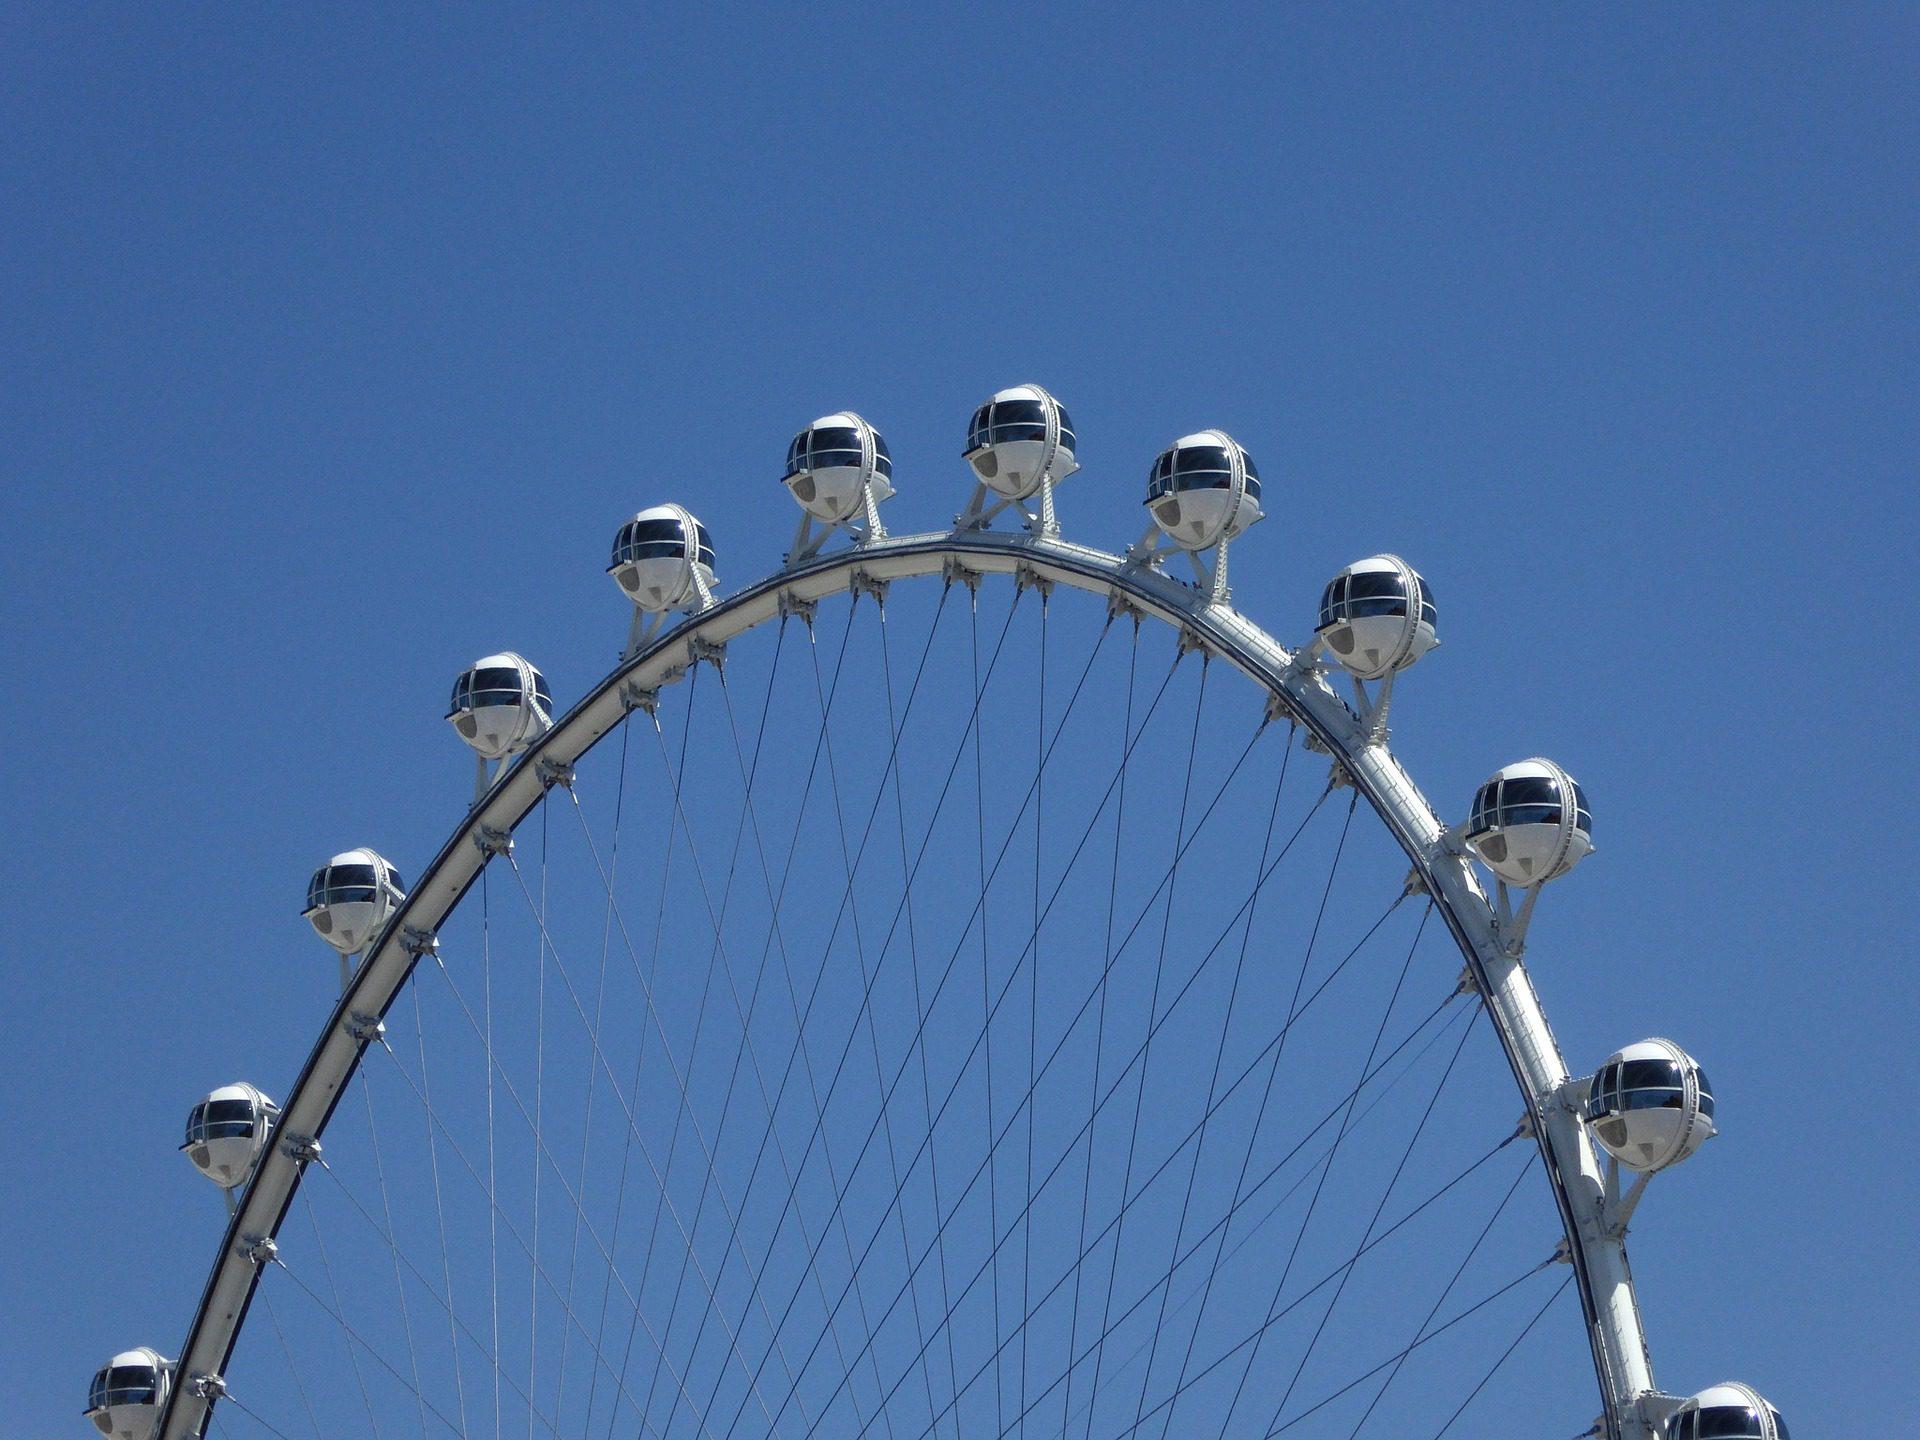 High Roller Observation Wheel, Las Vegas